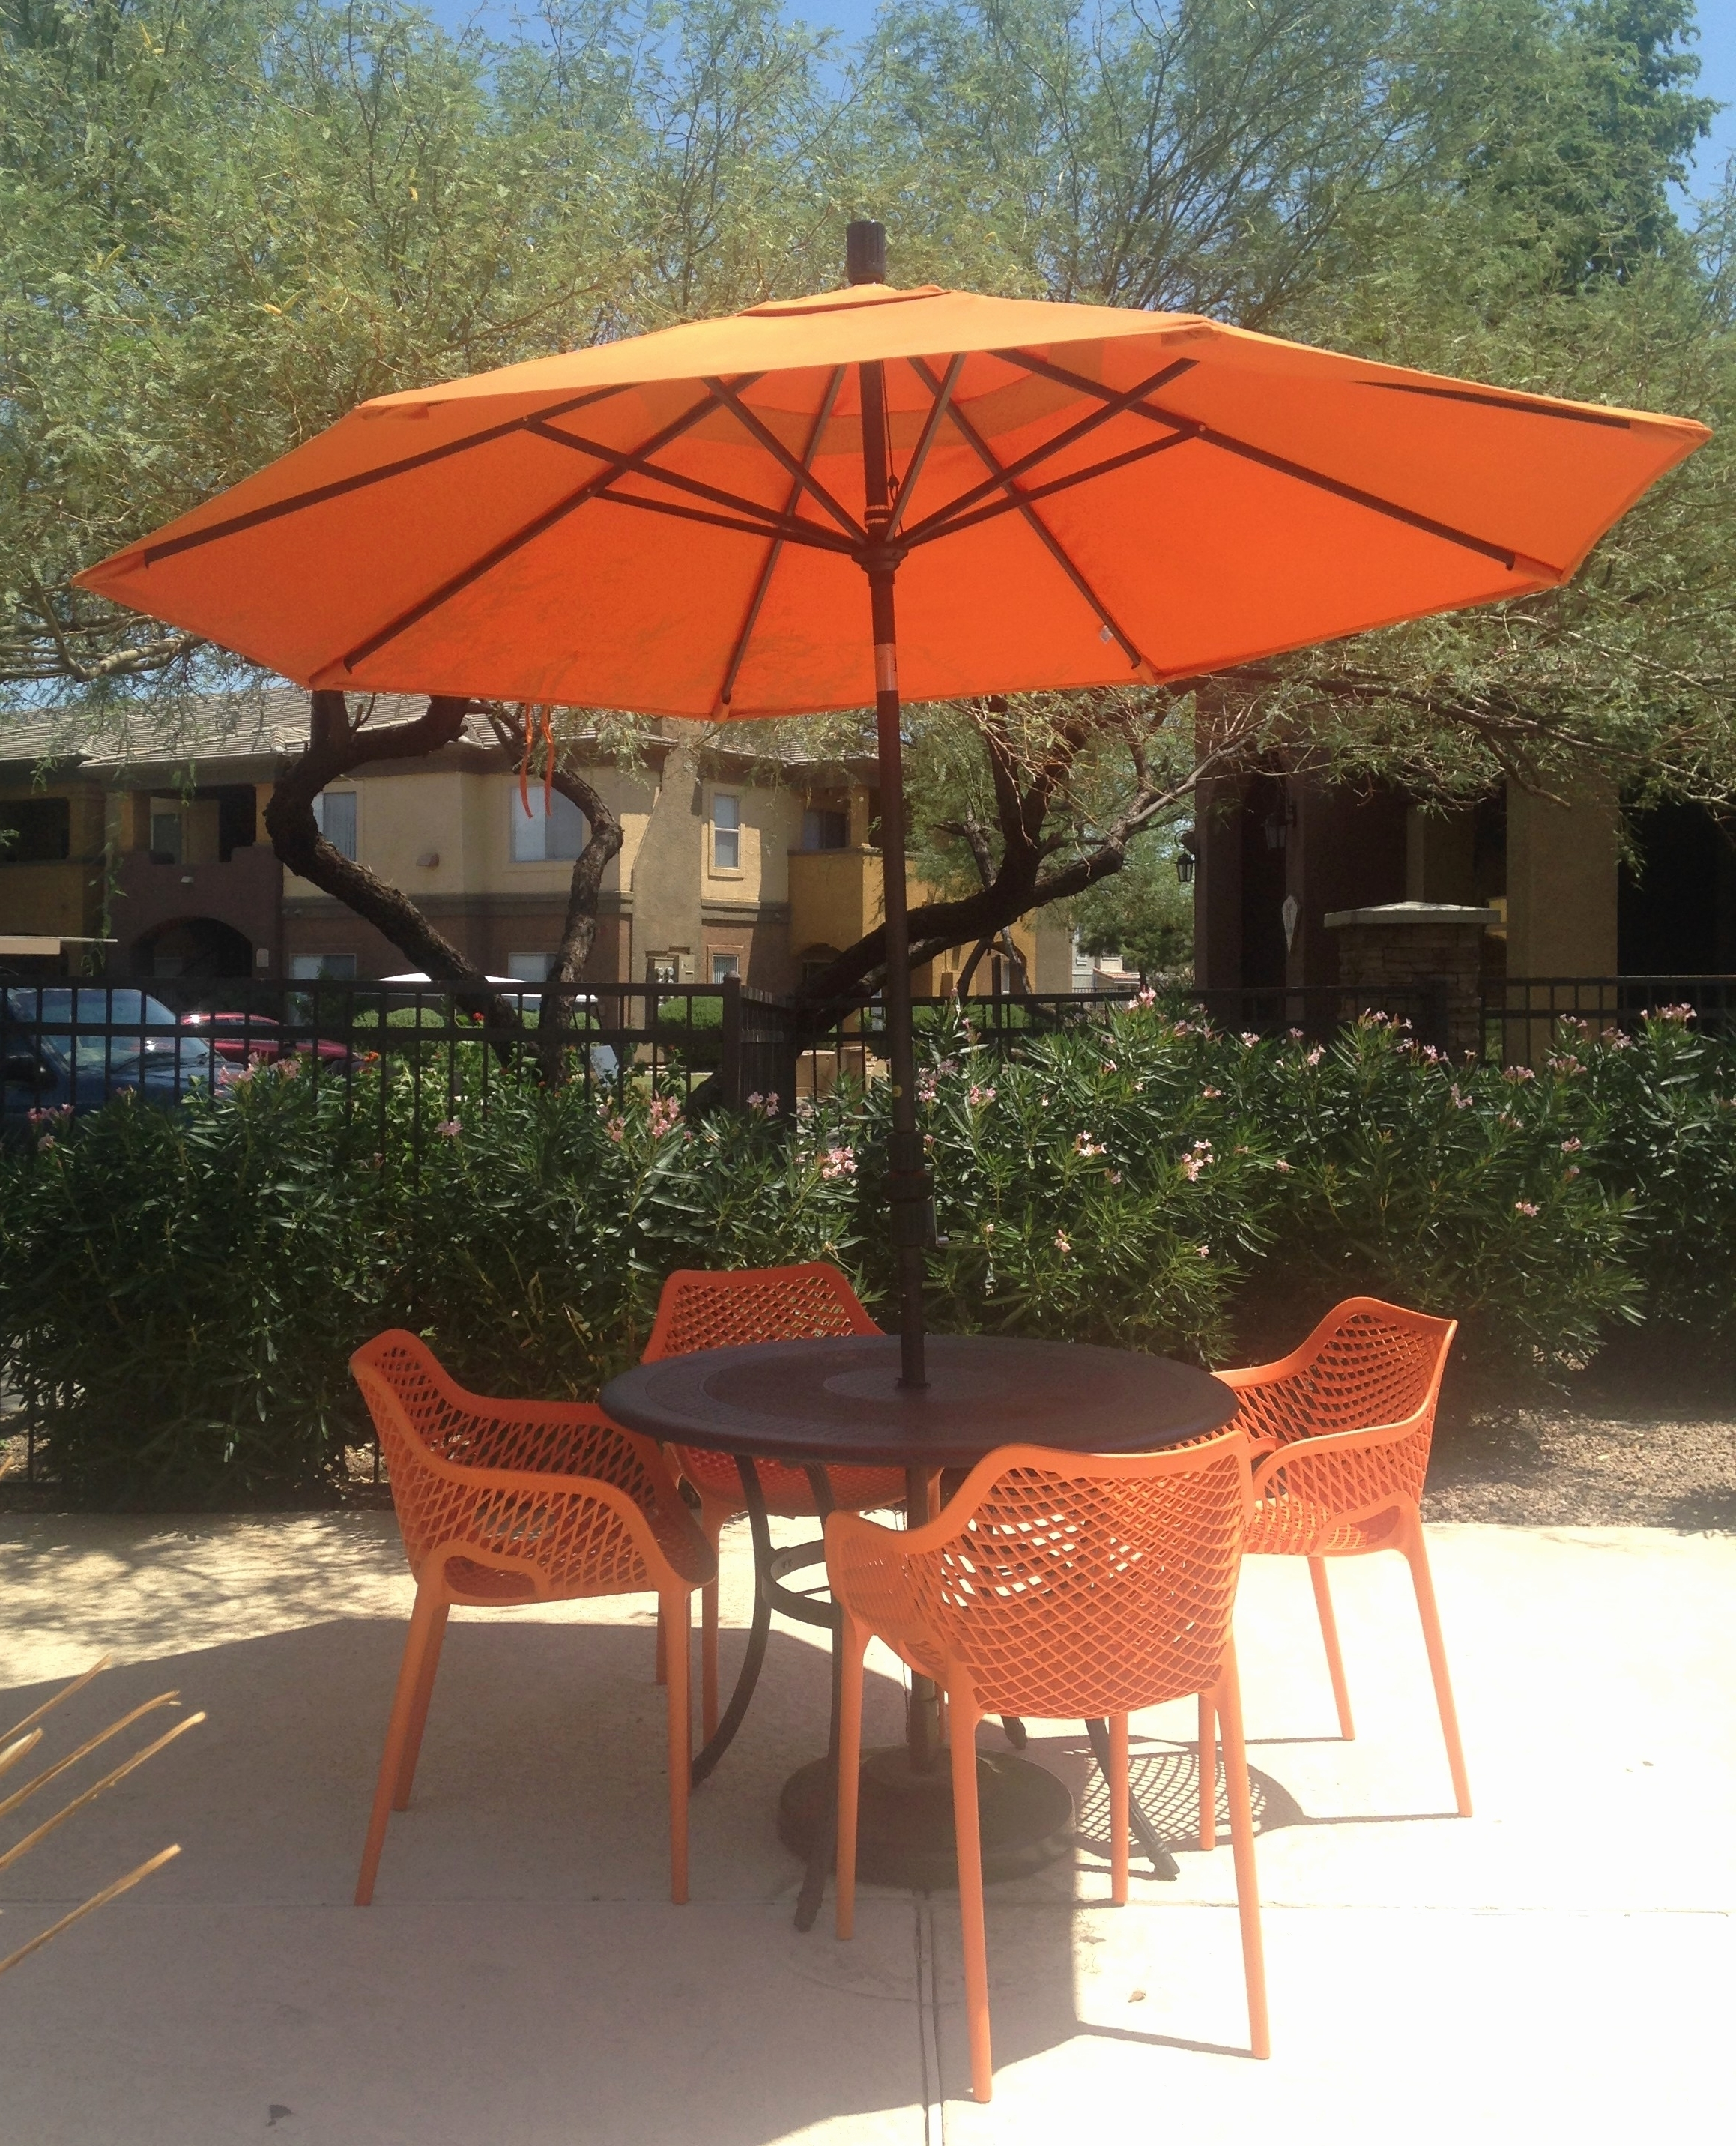 Elegant Vintage Patio Umbrella For Sale Graphics Home – Mc Carthy Regarding Most Current Vintage Patio Umbrellas For Sale (View 3 of 20)